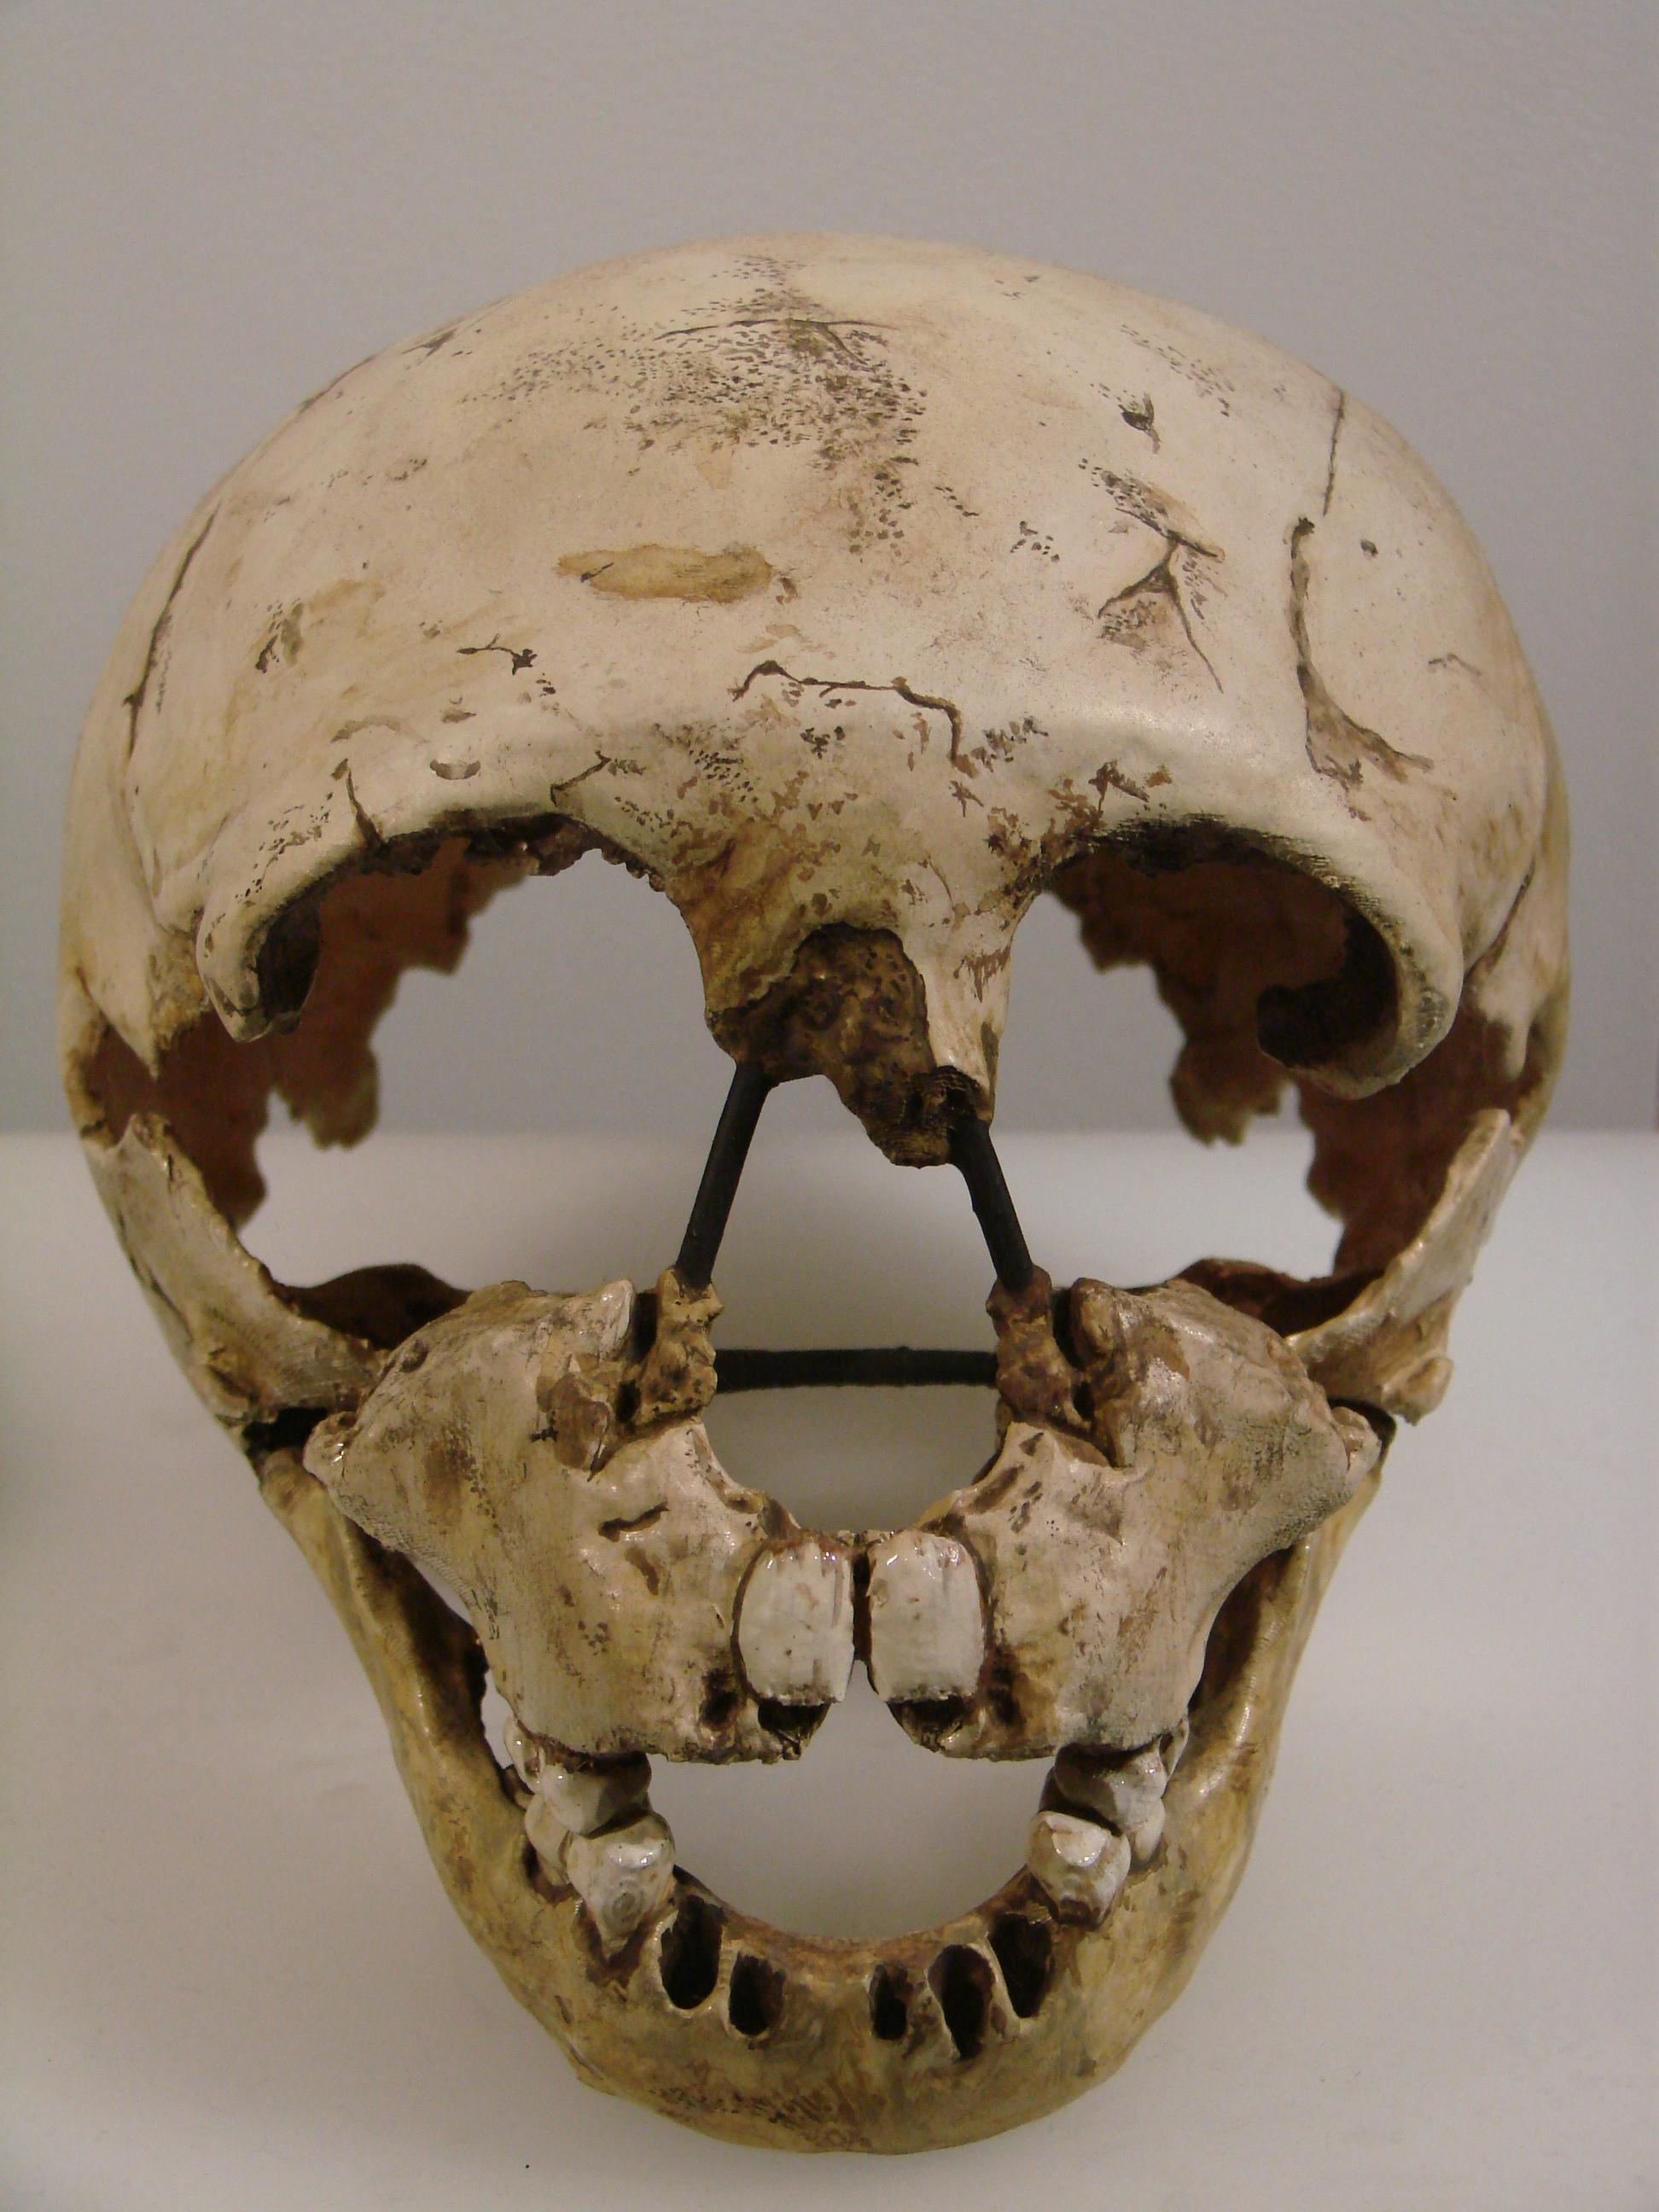 File:Homo neanderthalensis face (University of Zurich).JPG - Wikipedia Neanderthal 1